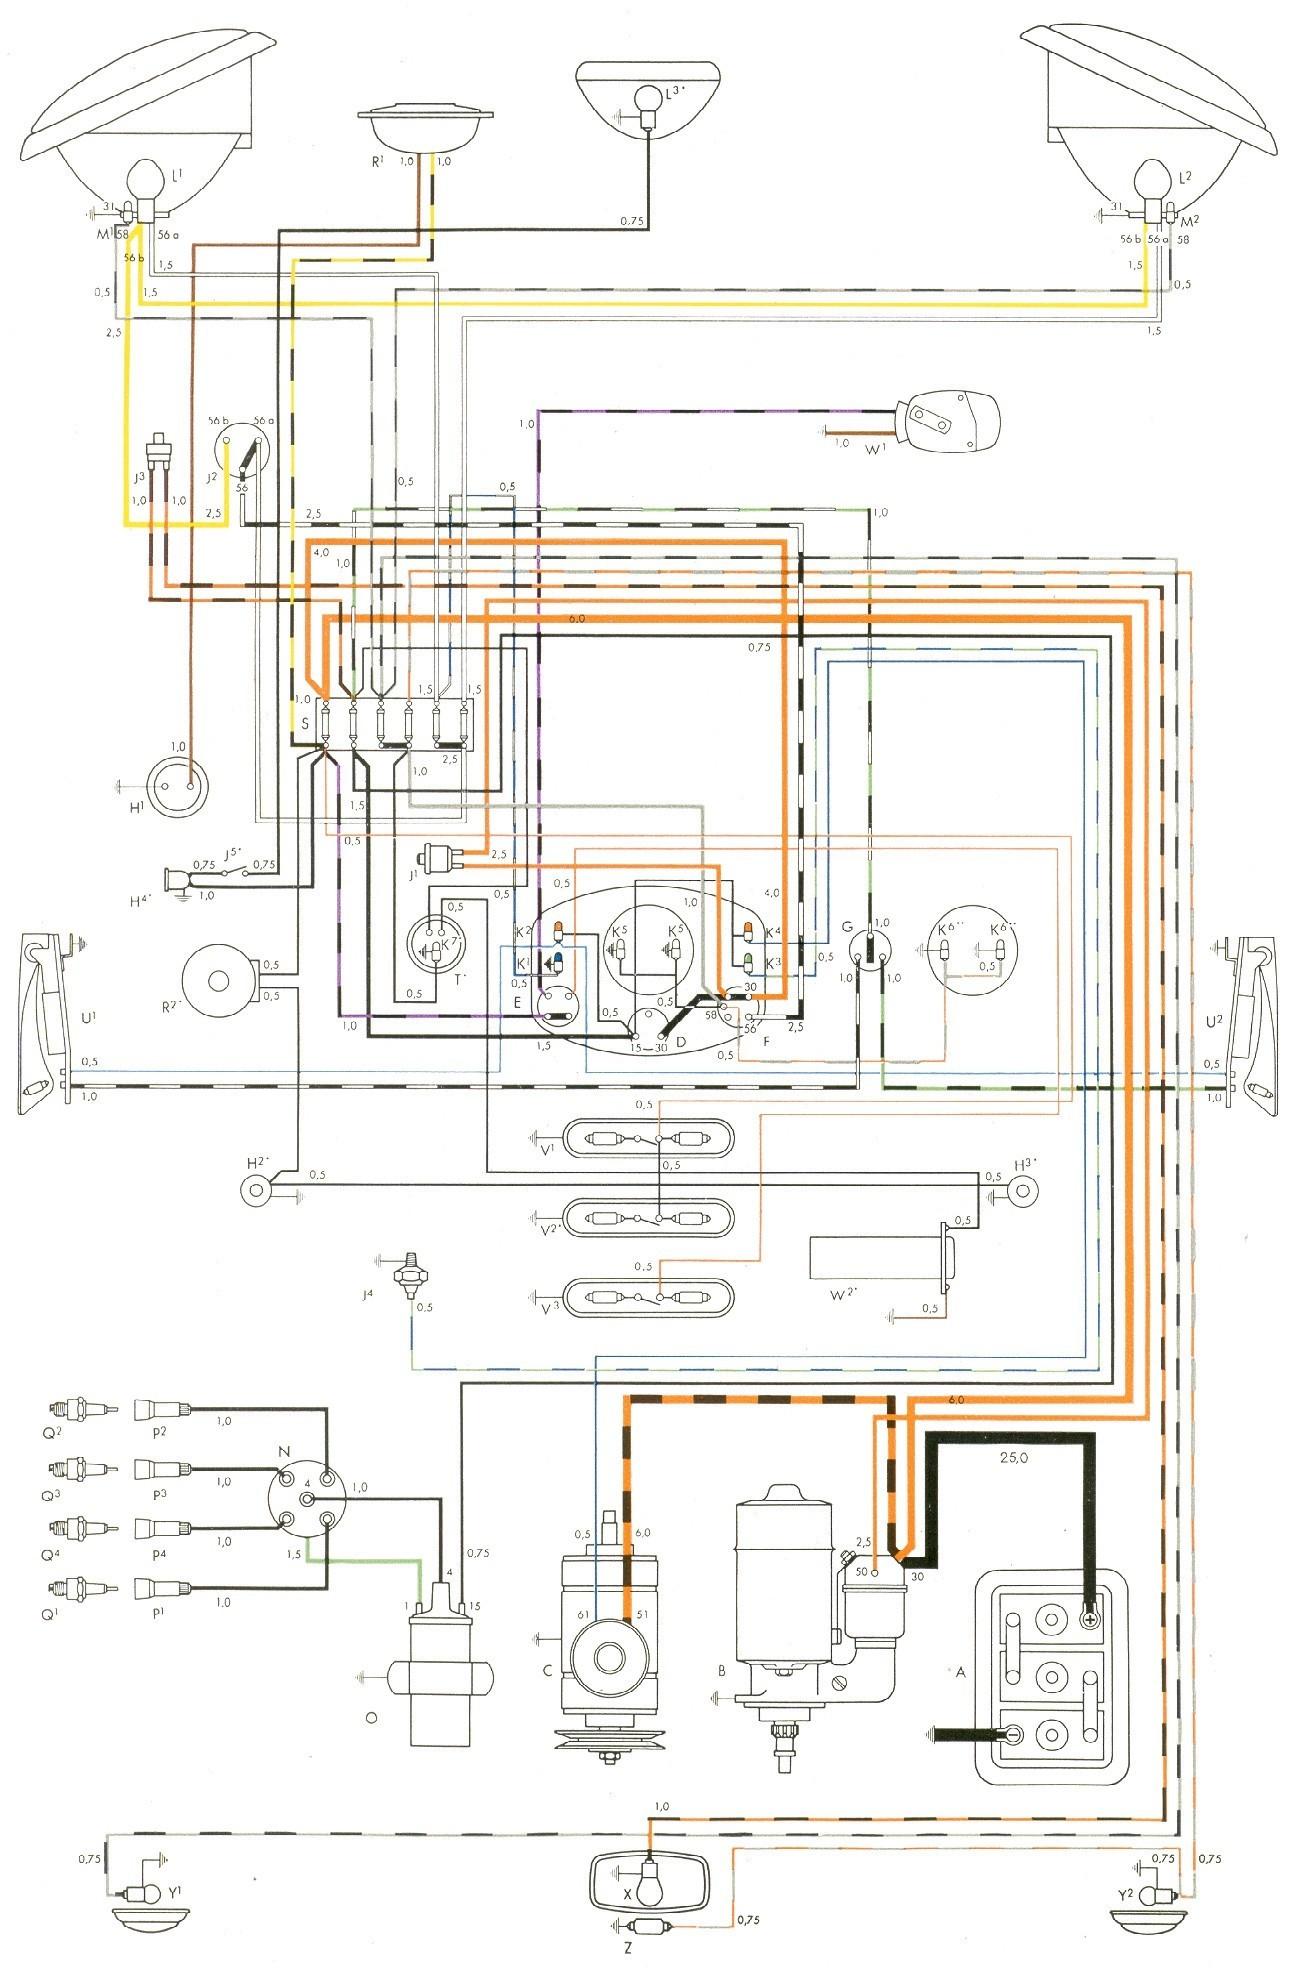 hight resolution of vw voltage regulator wiring diagram 1973 simple wiring diagrams rh 22 studio011 de 1974 vw alternator wiring diagram snowmobile voltage regulator wiring